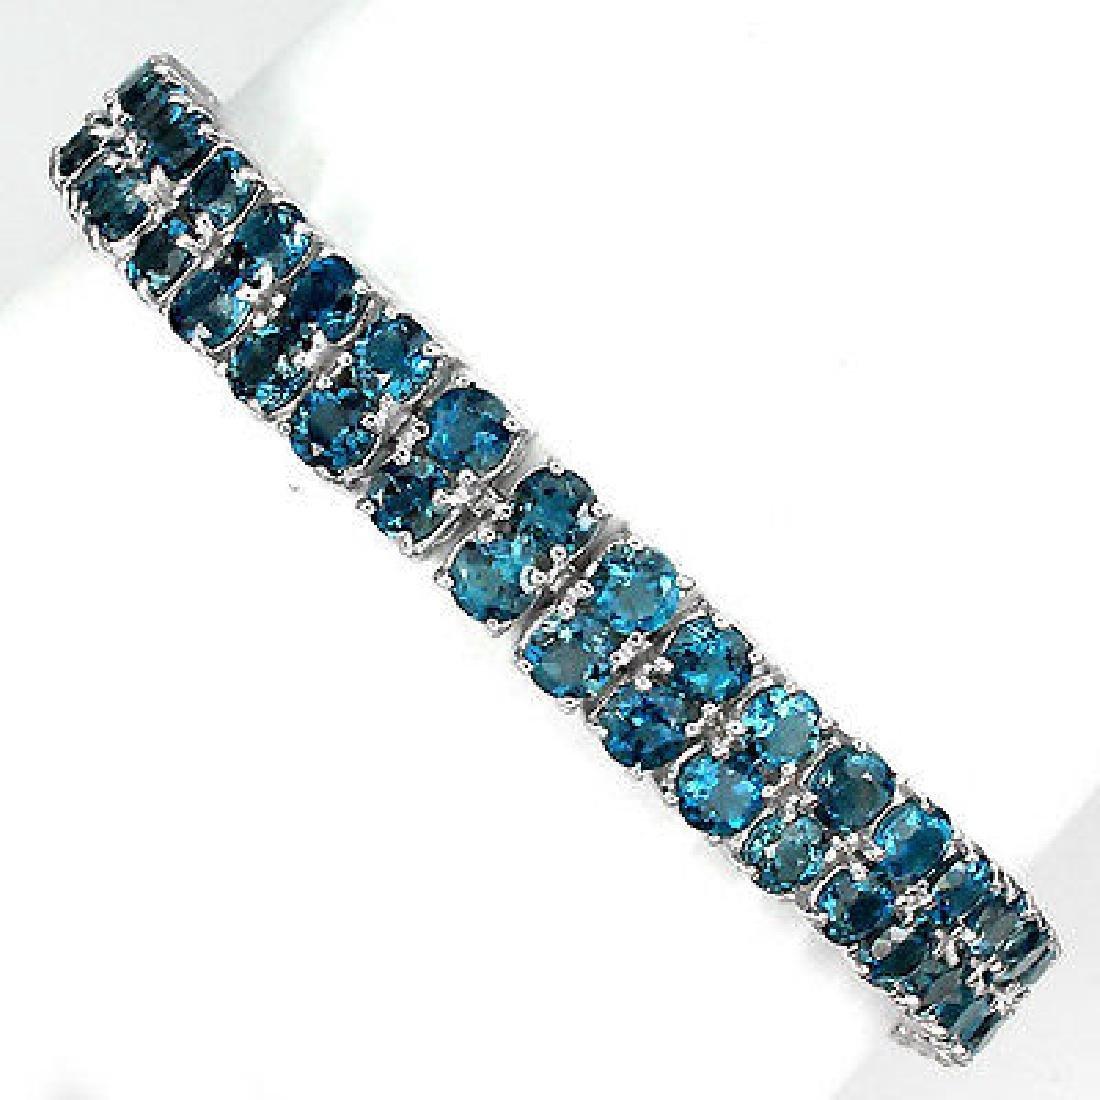 Stunning London Blue Topaz Bracelet